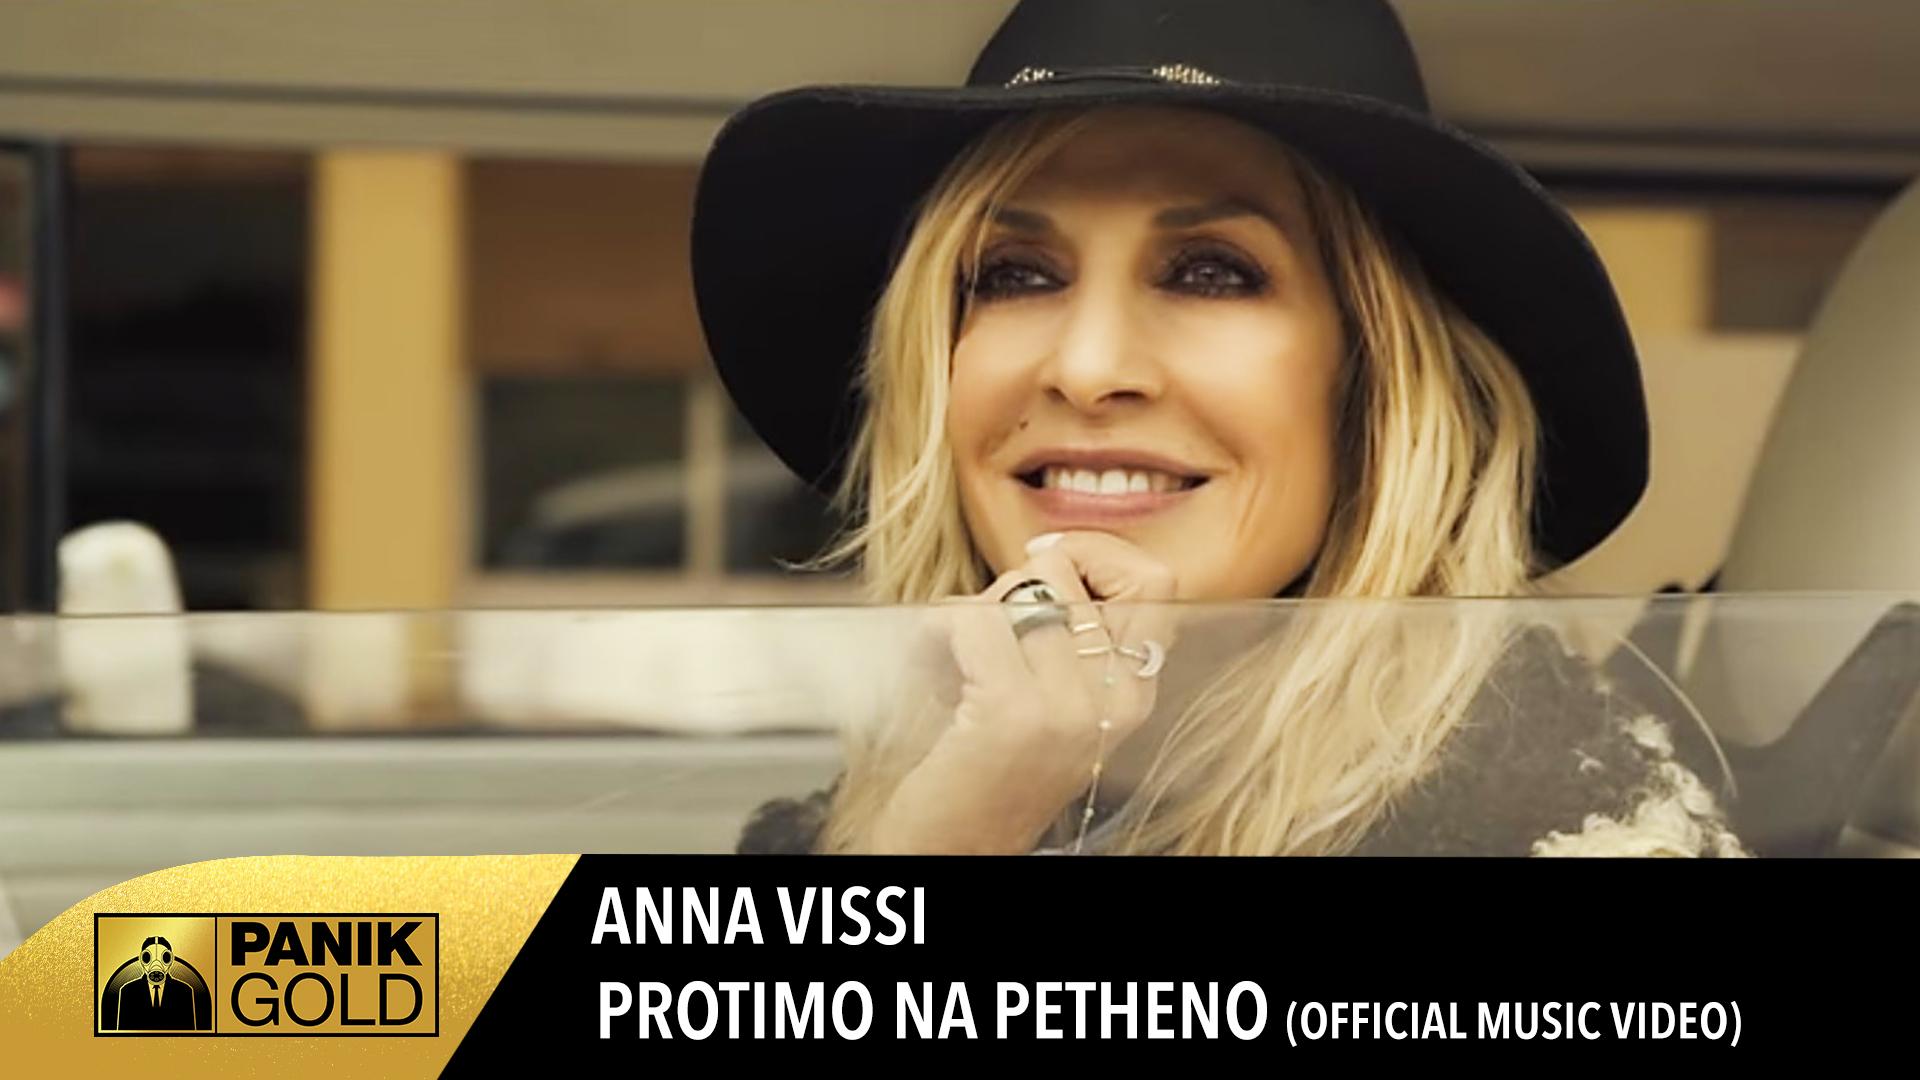 ANNA VISSI PROTIMO THUMB